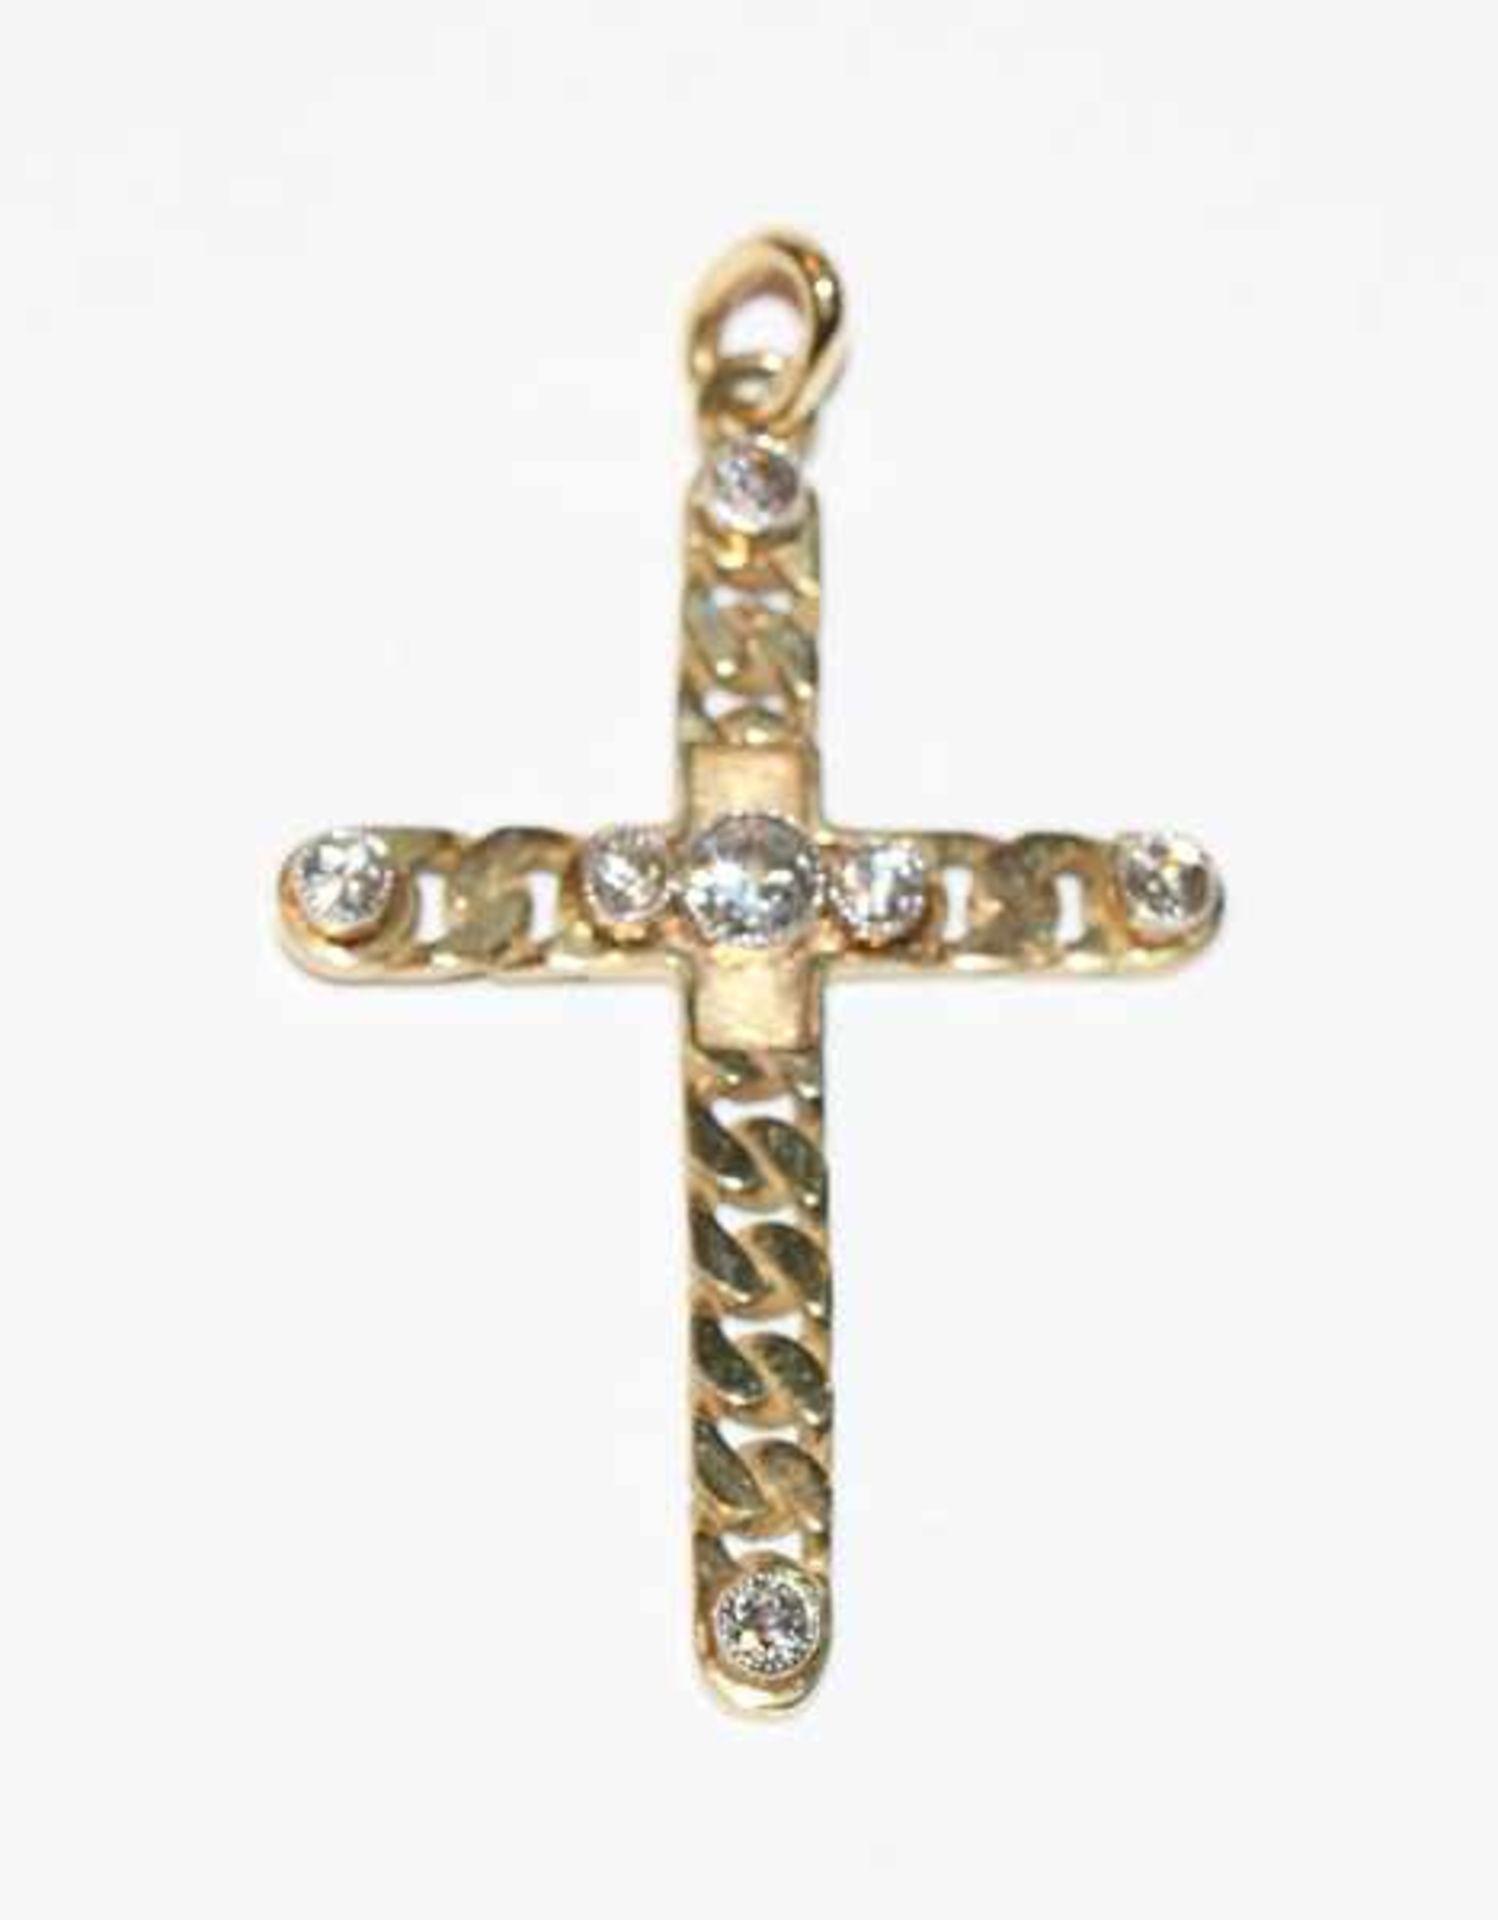 14 k Gelbgold Kreuz-Anhänger mit 6 Diamanten, TW/VS, zus. 0,65 ct., L 4,5 cm, klassische Handarbeit